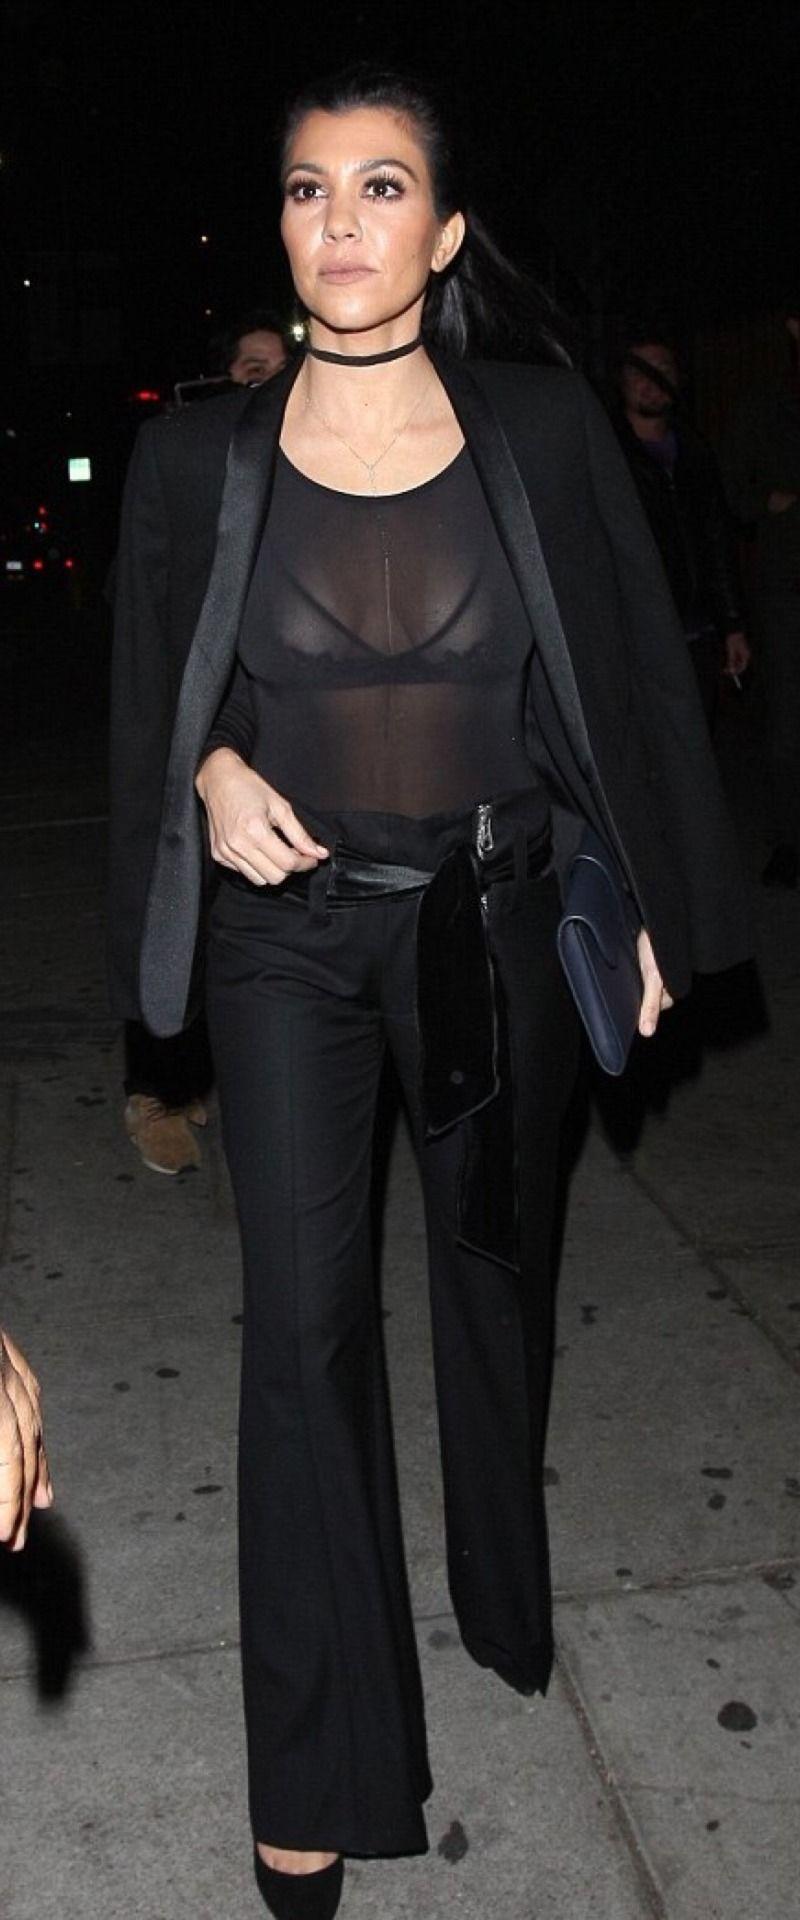 Kourtney Kardashian  KARDASHIANS  Pinterest  Kourtney kardashian